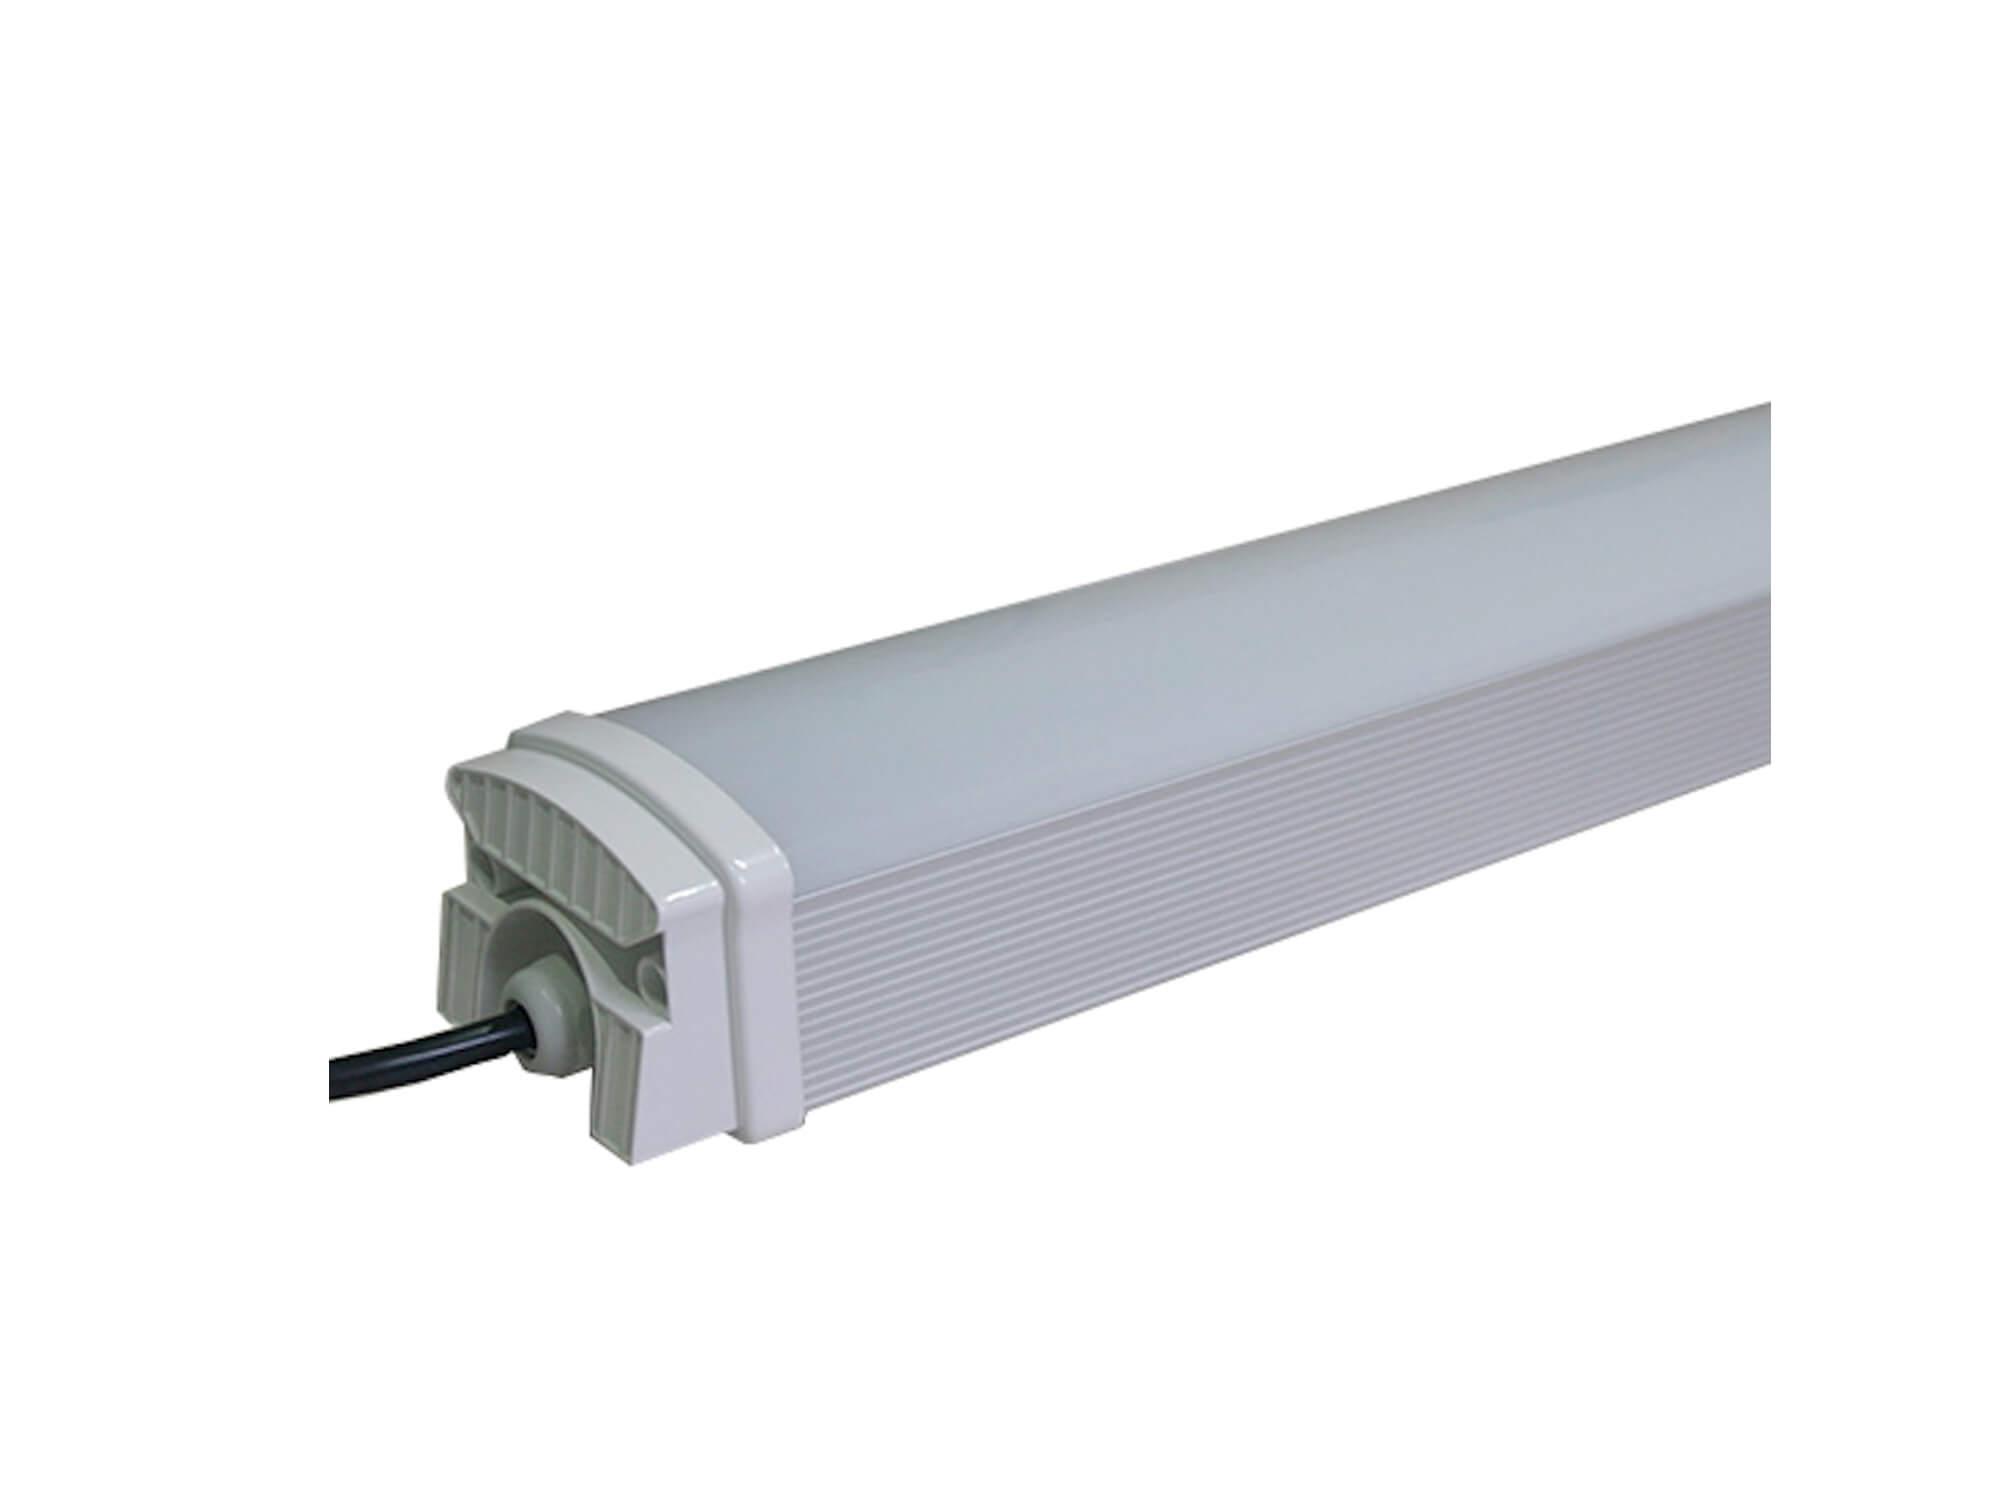 Tri Proof Lights Linear Batten Lights With Sensor